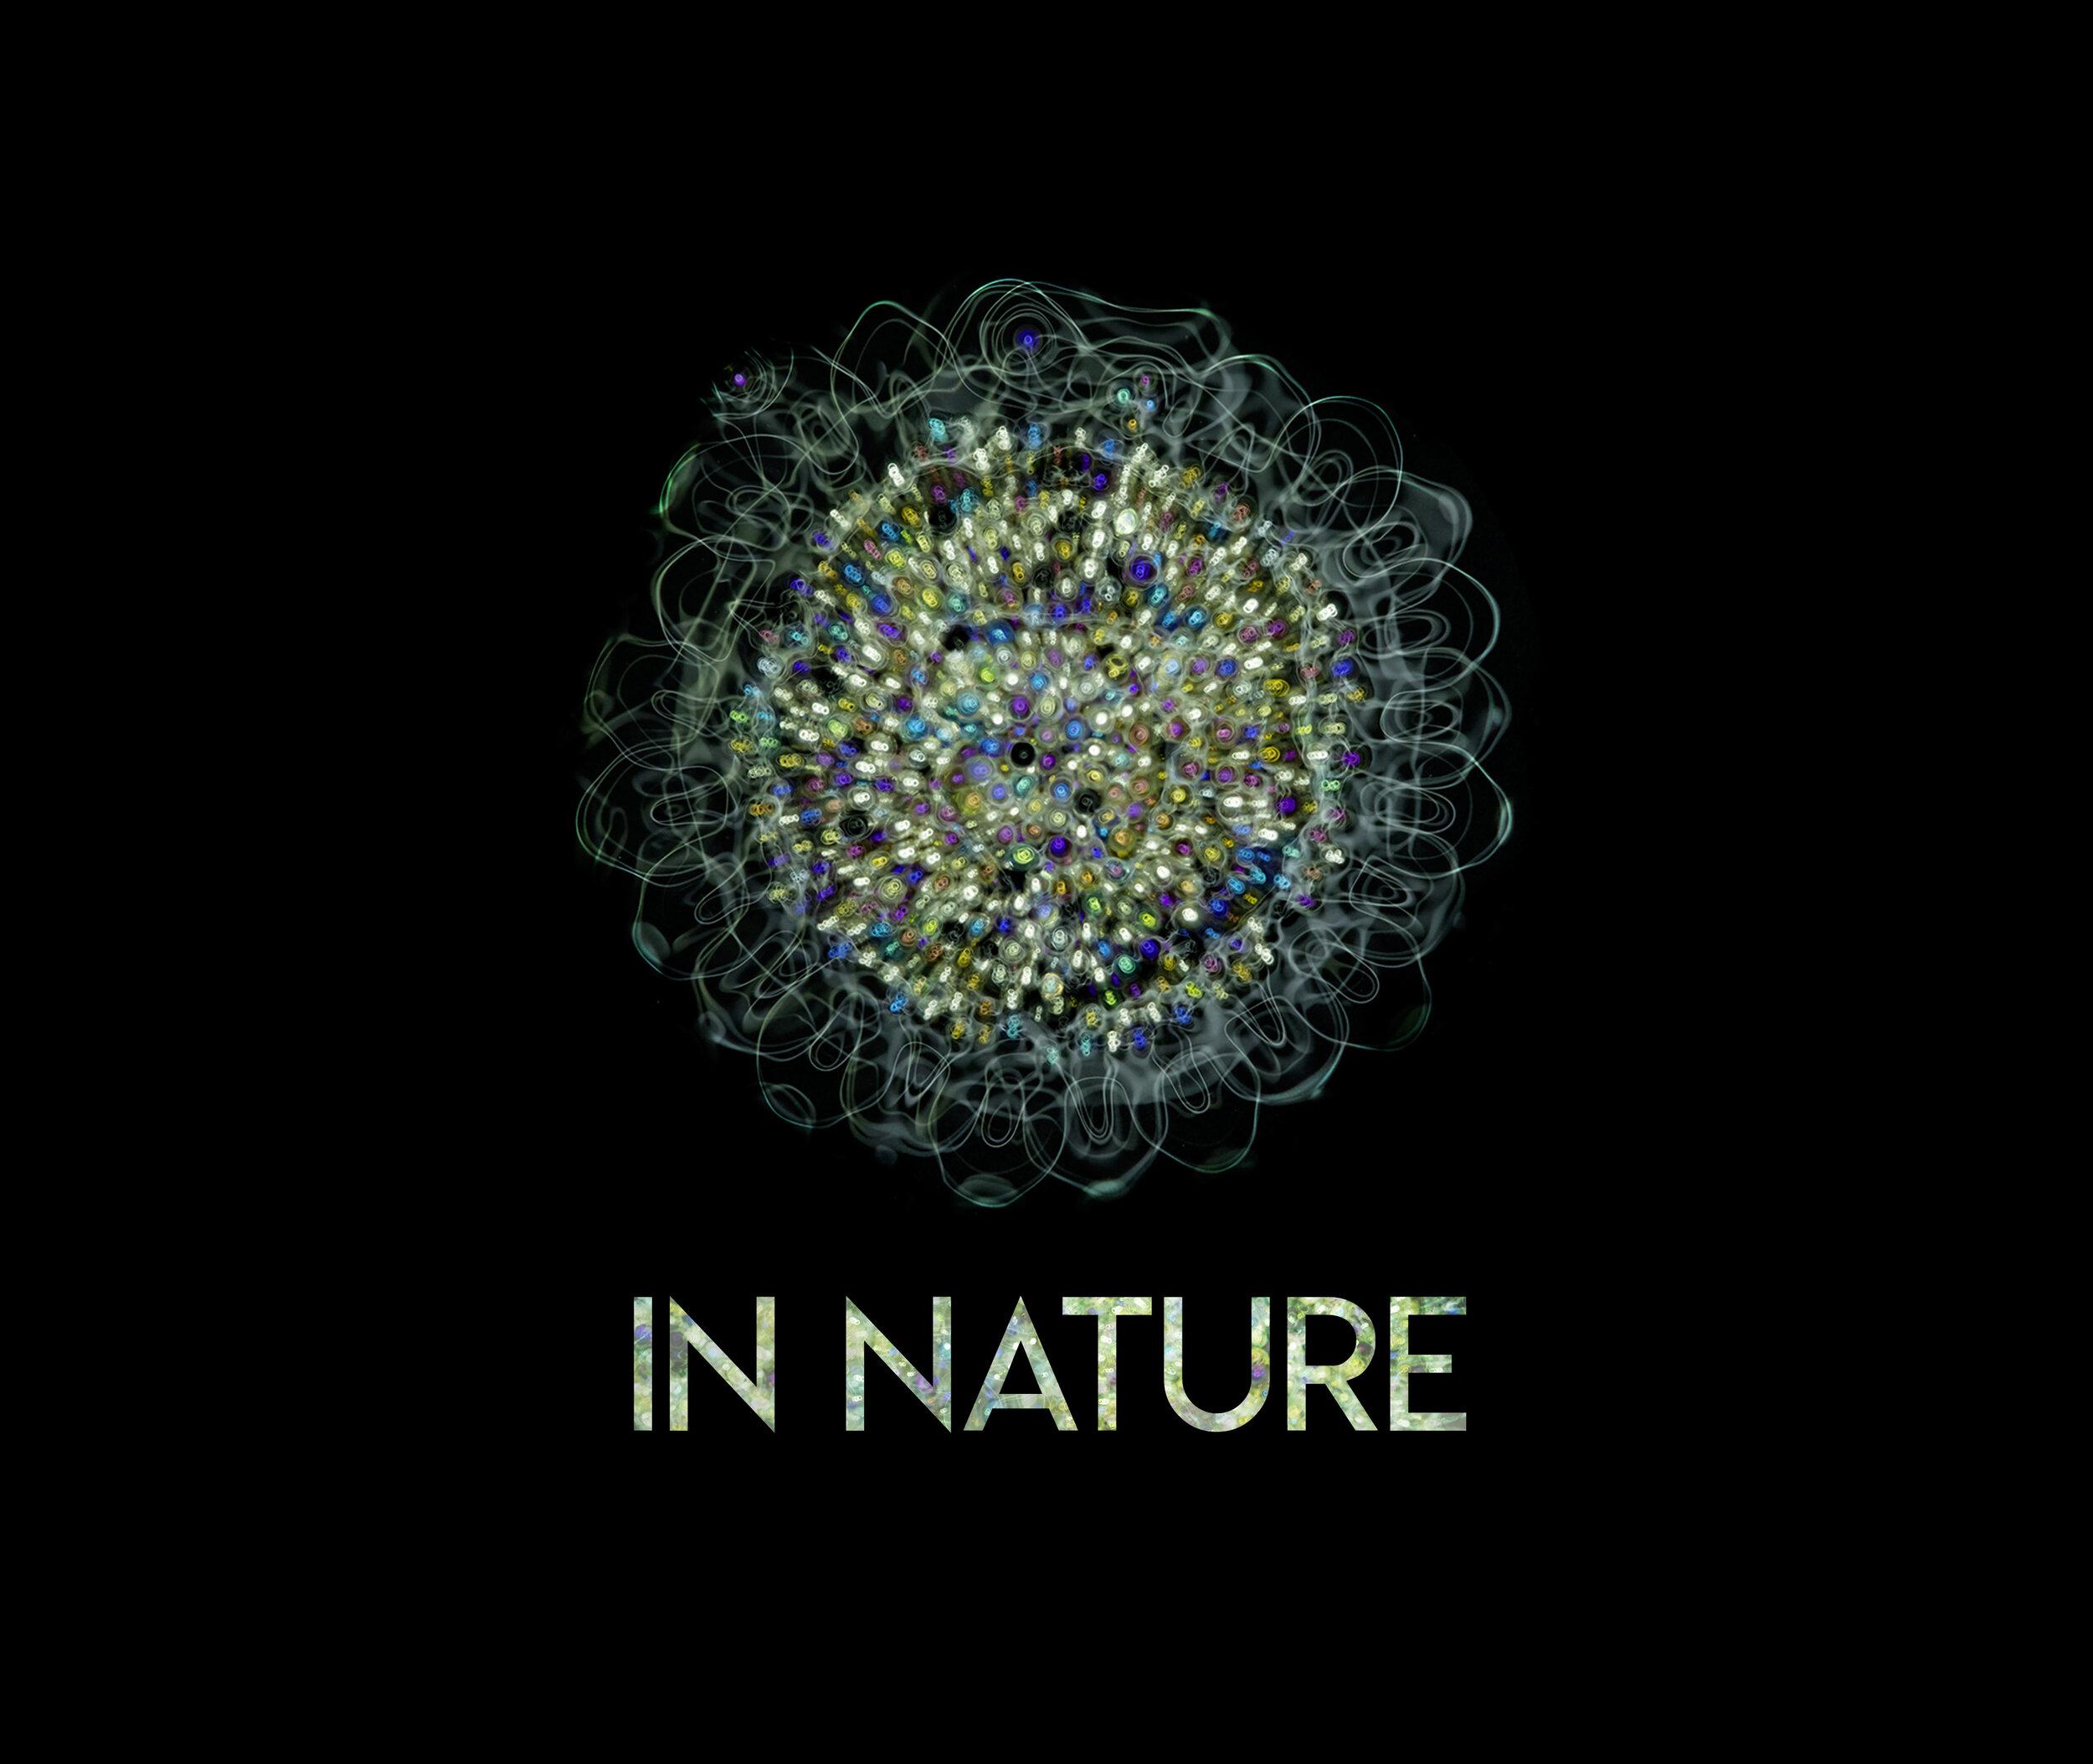 Image: 'Cymatic Flower' © Linden Gledhill